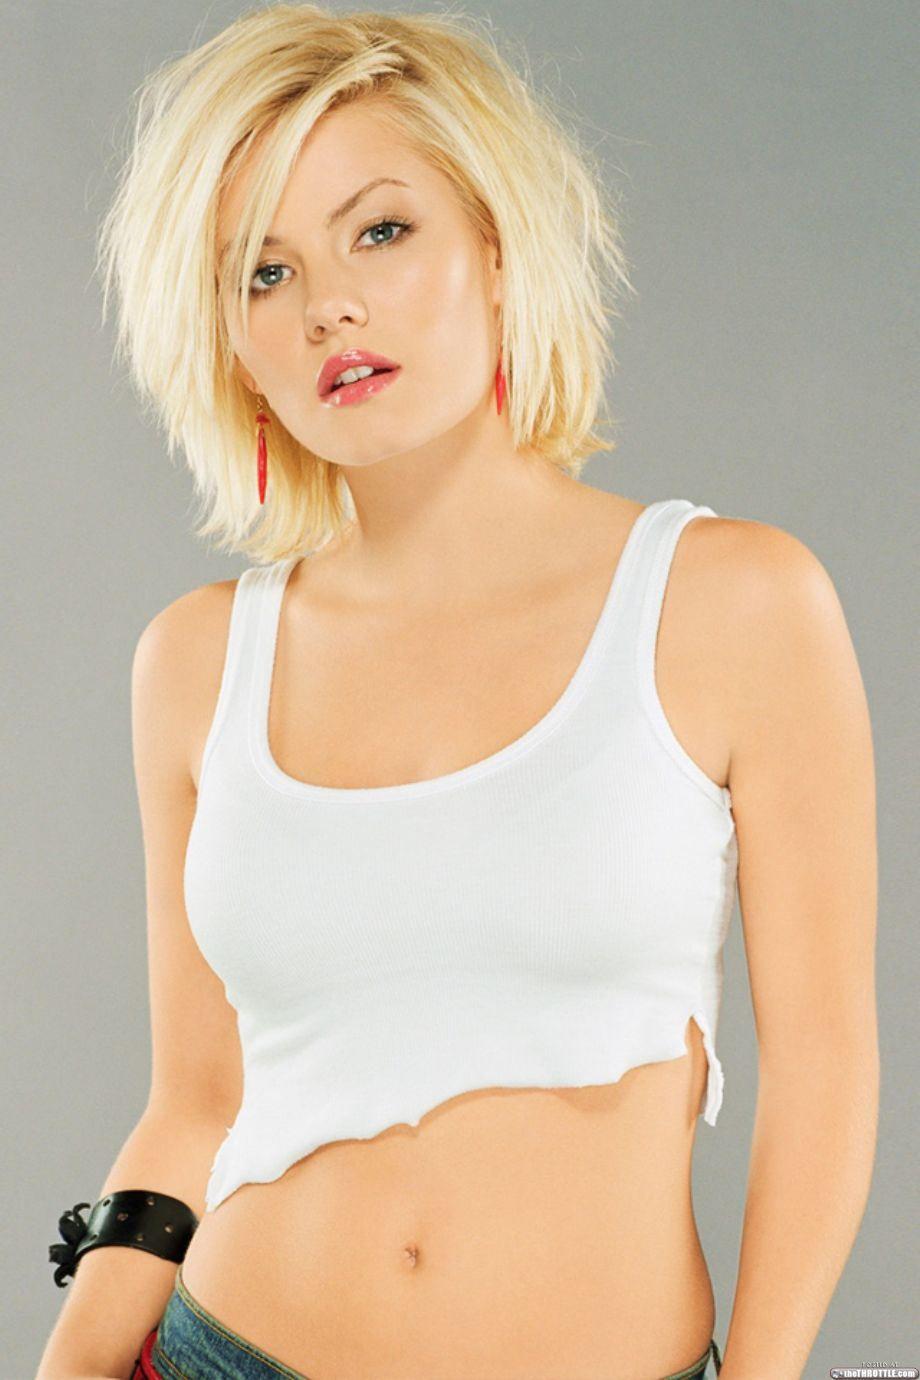 Masturbation techniques elisha cuthbert lesbian icon